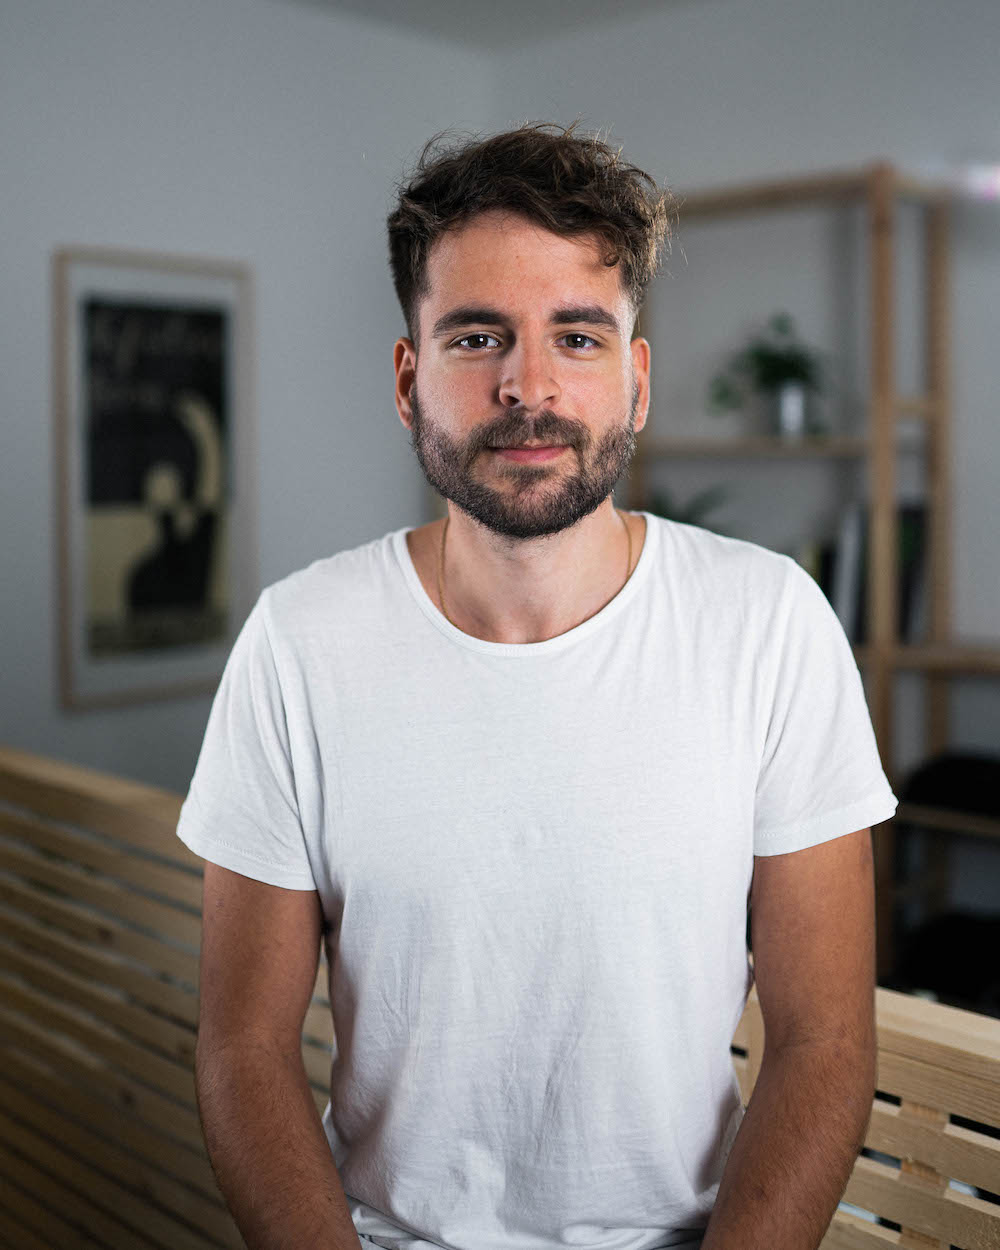 Florian Blach